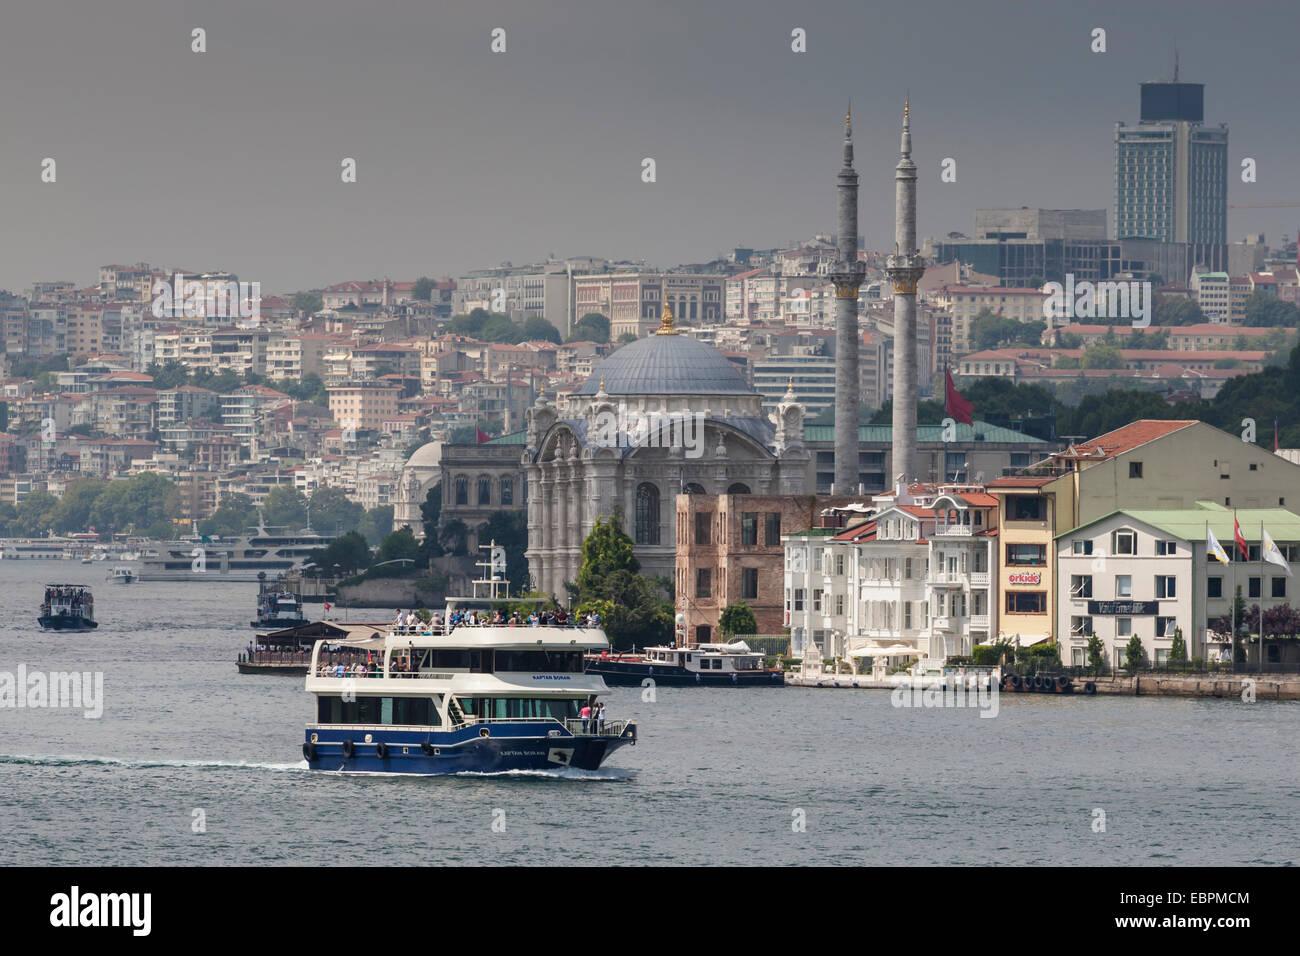 Ortakoy Mecidiye Mosque and passenger ferry, Ortakoy, from Bosphorus Strait with Istanbul city skyline behind, Istanbul, - Stock Image